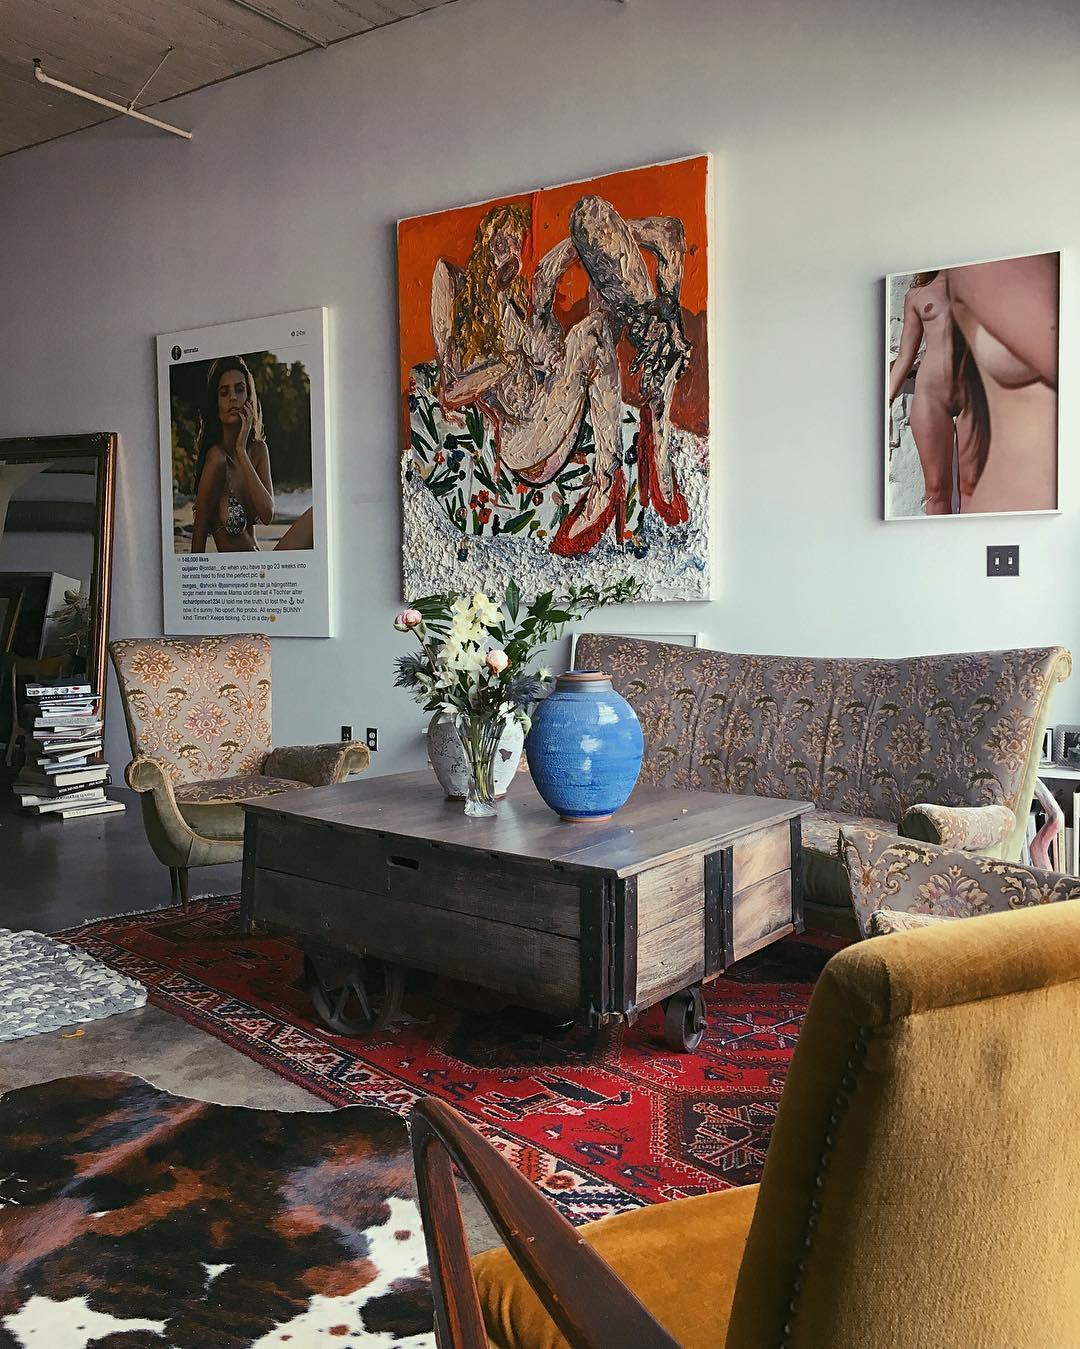 inside emily ratajkowski's beautiful, eclectic art-filled la loft